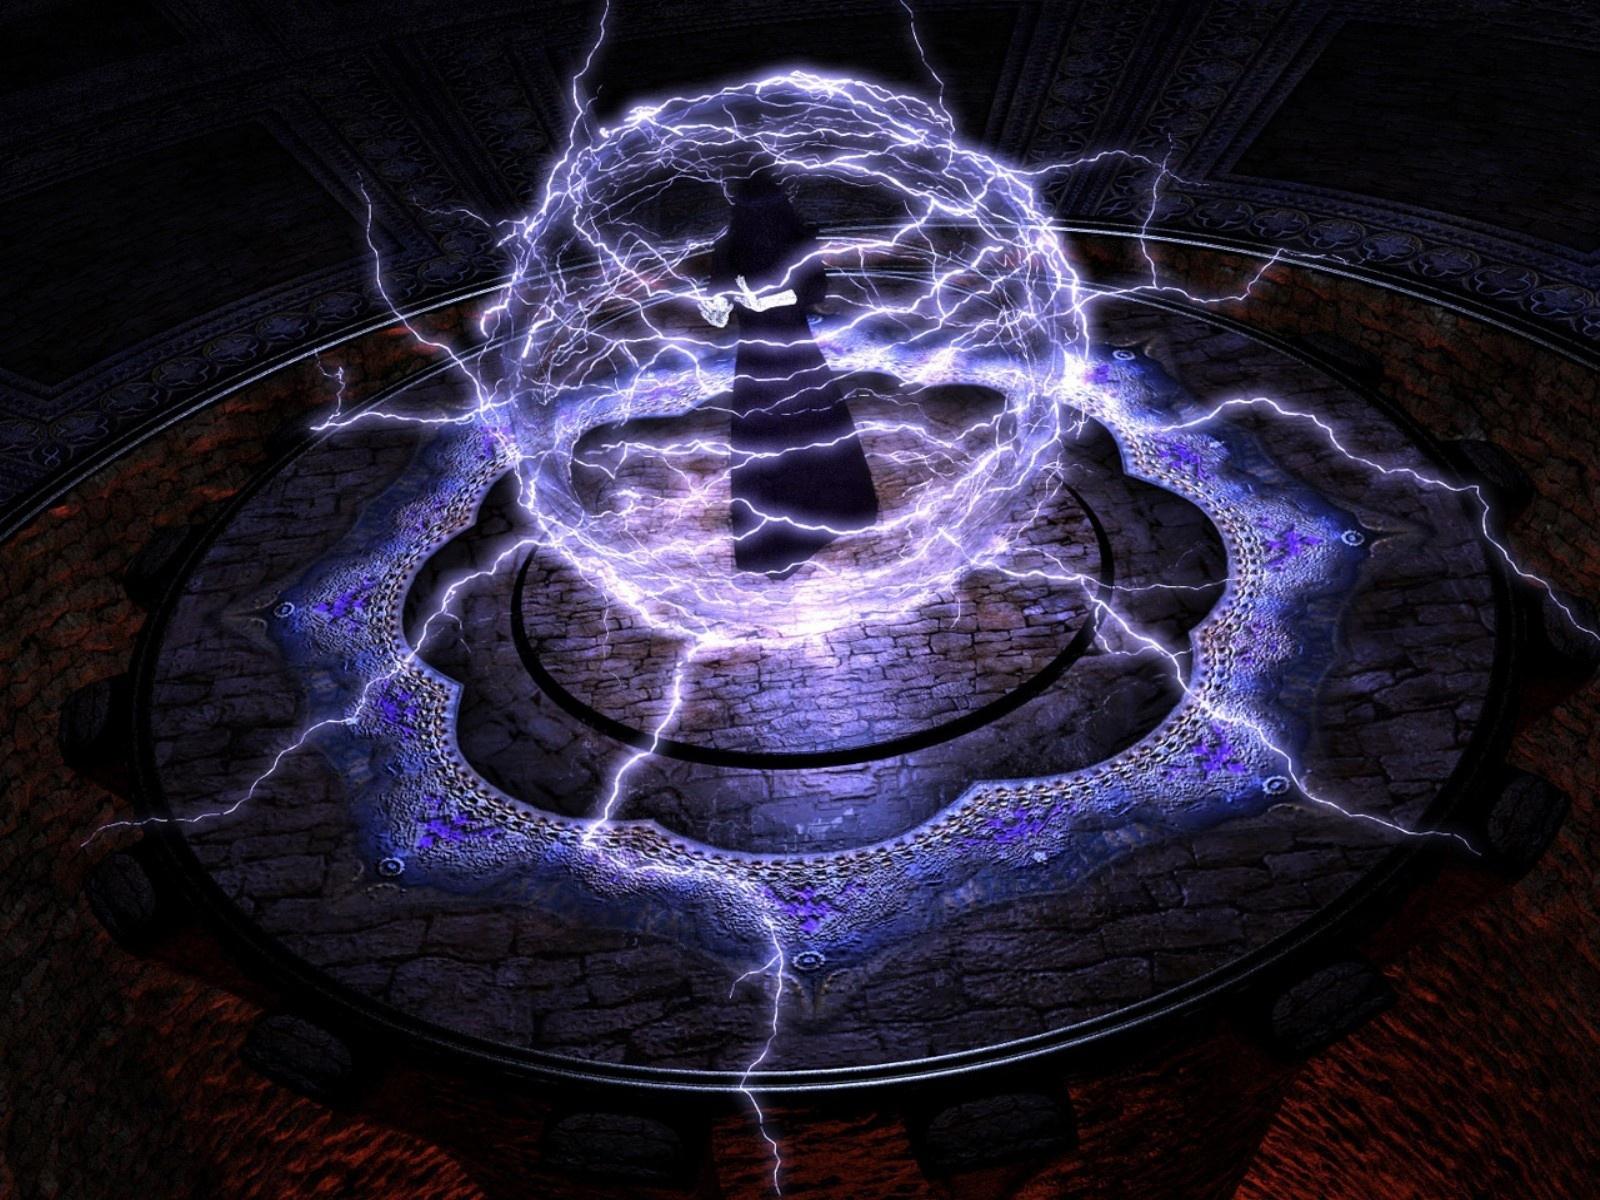 Dark_Magic_Master_Wallpaper jpg?m=1399676400